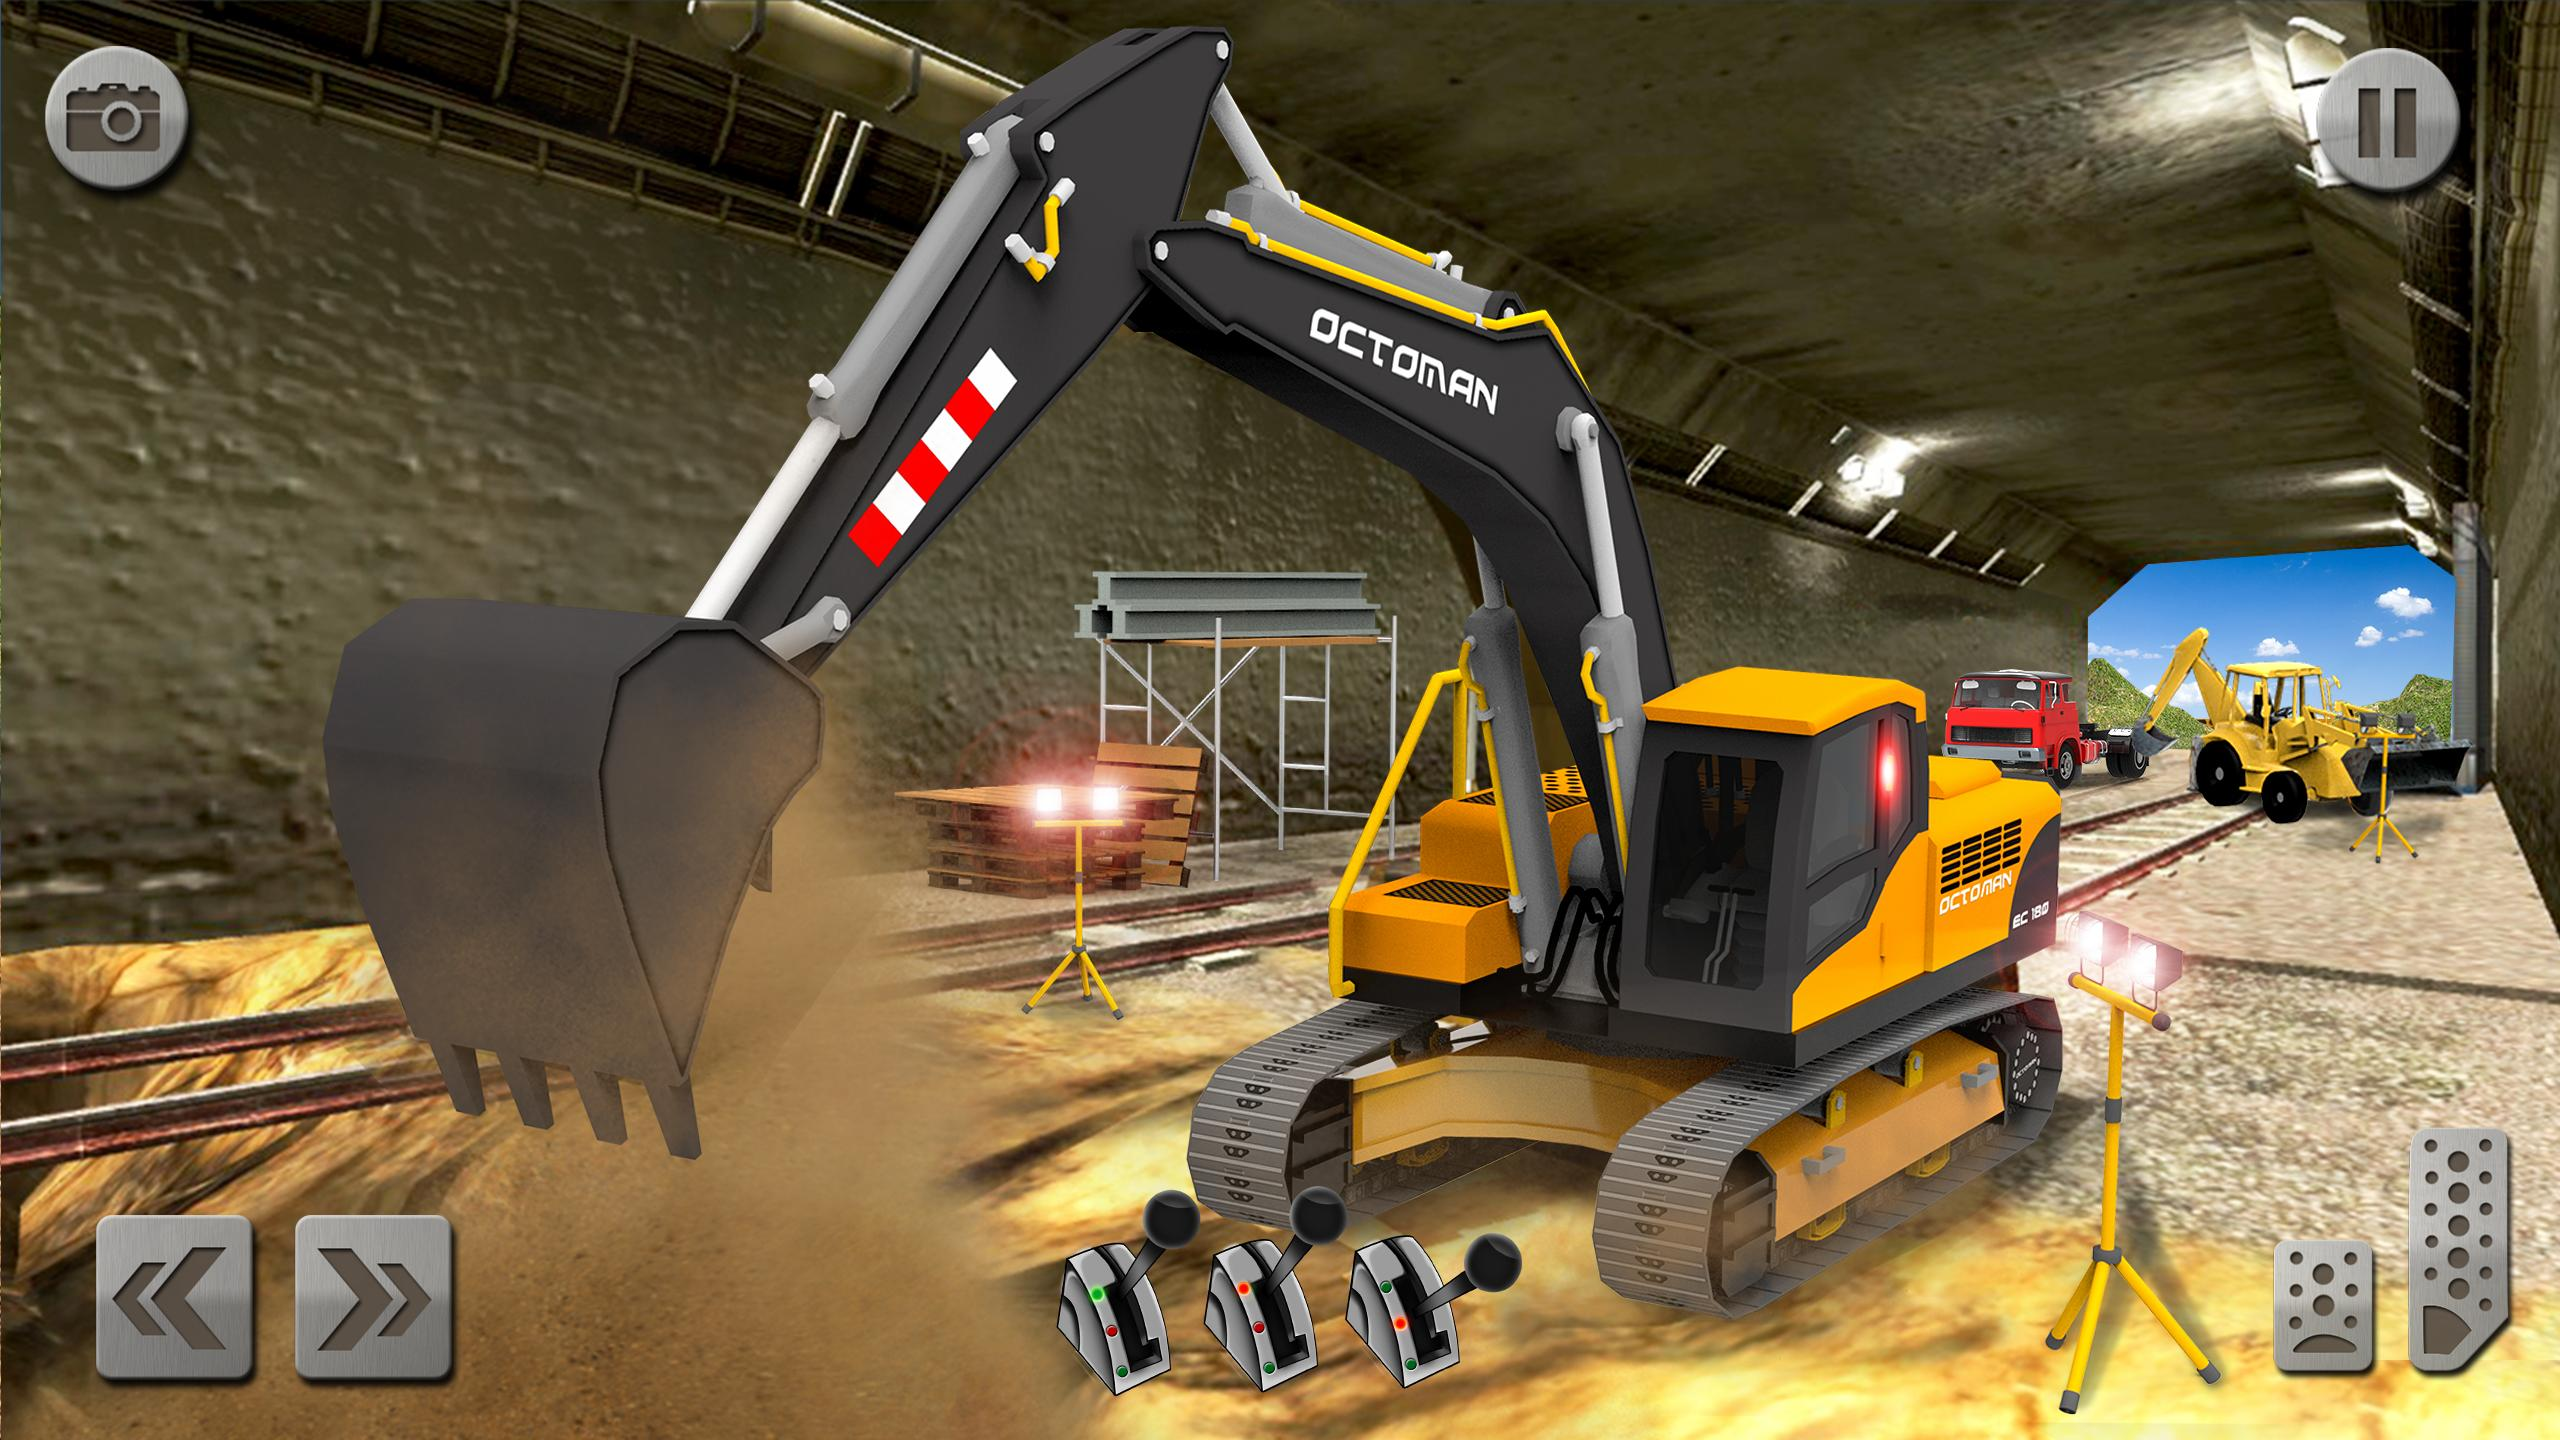 Sand Excavator Truck Driving Rescue Simulator game 5.2 Screenshot 8